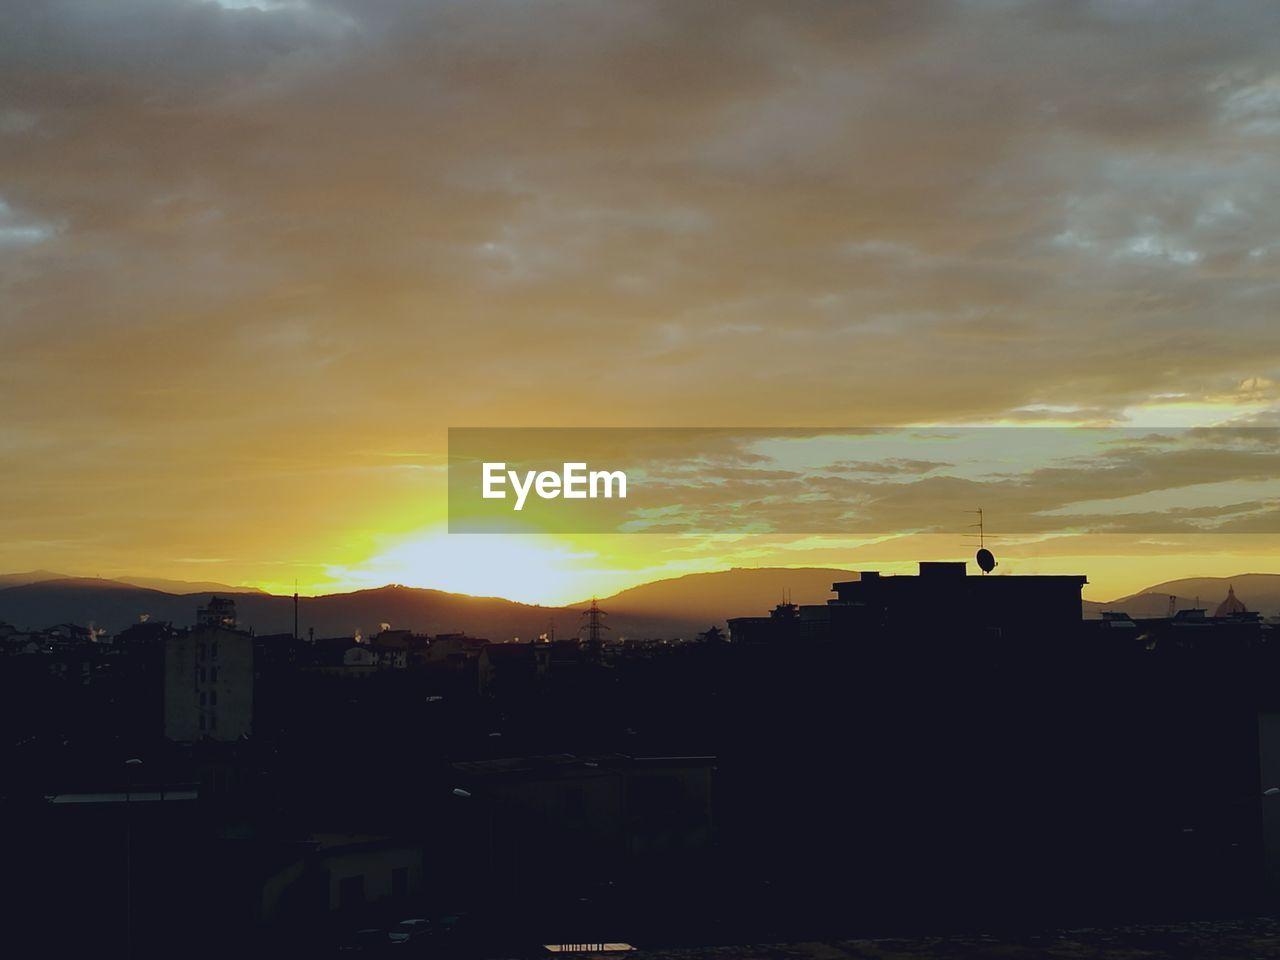 sunset, silhouette, architecture, building exterior, built structure, orange color, sky, city, no people, cityscape, cloud - sky, outdoors, travel destinations, skyscraper, nature, beauty in nature